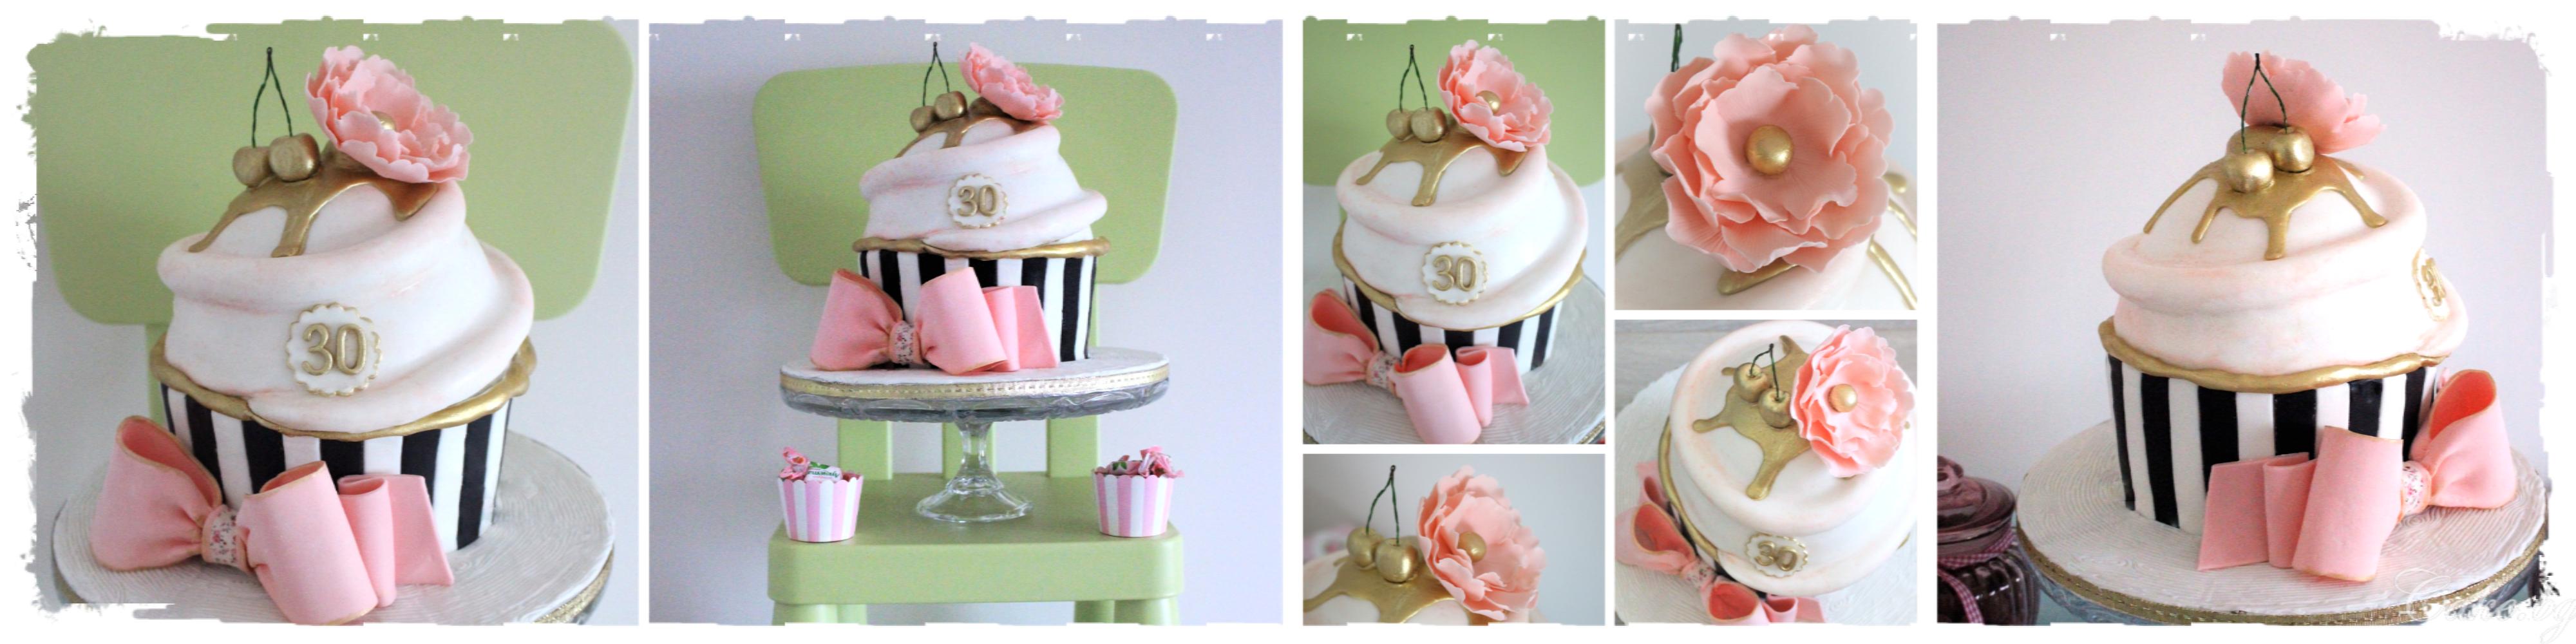 Торта Къпкейк (Giant Cupcake)